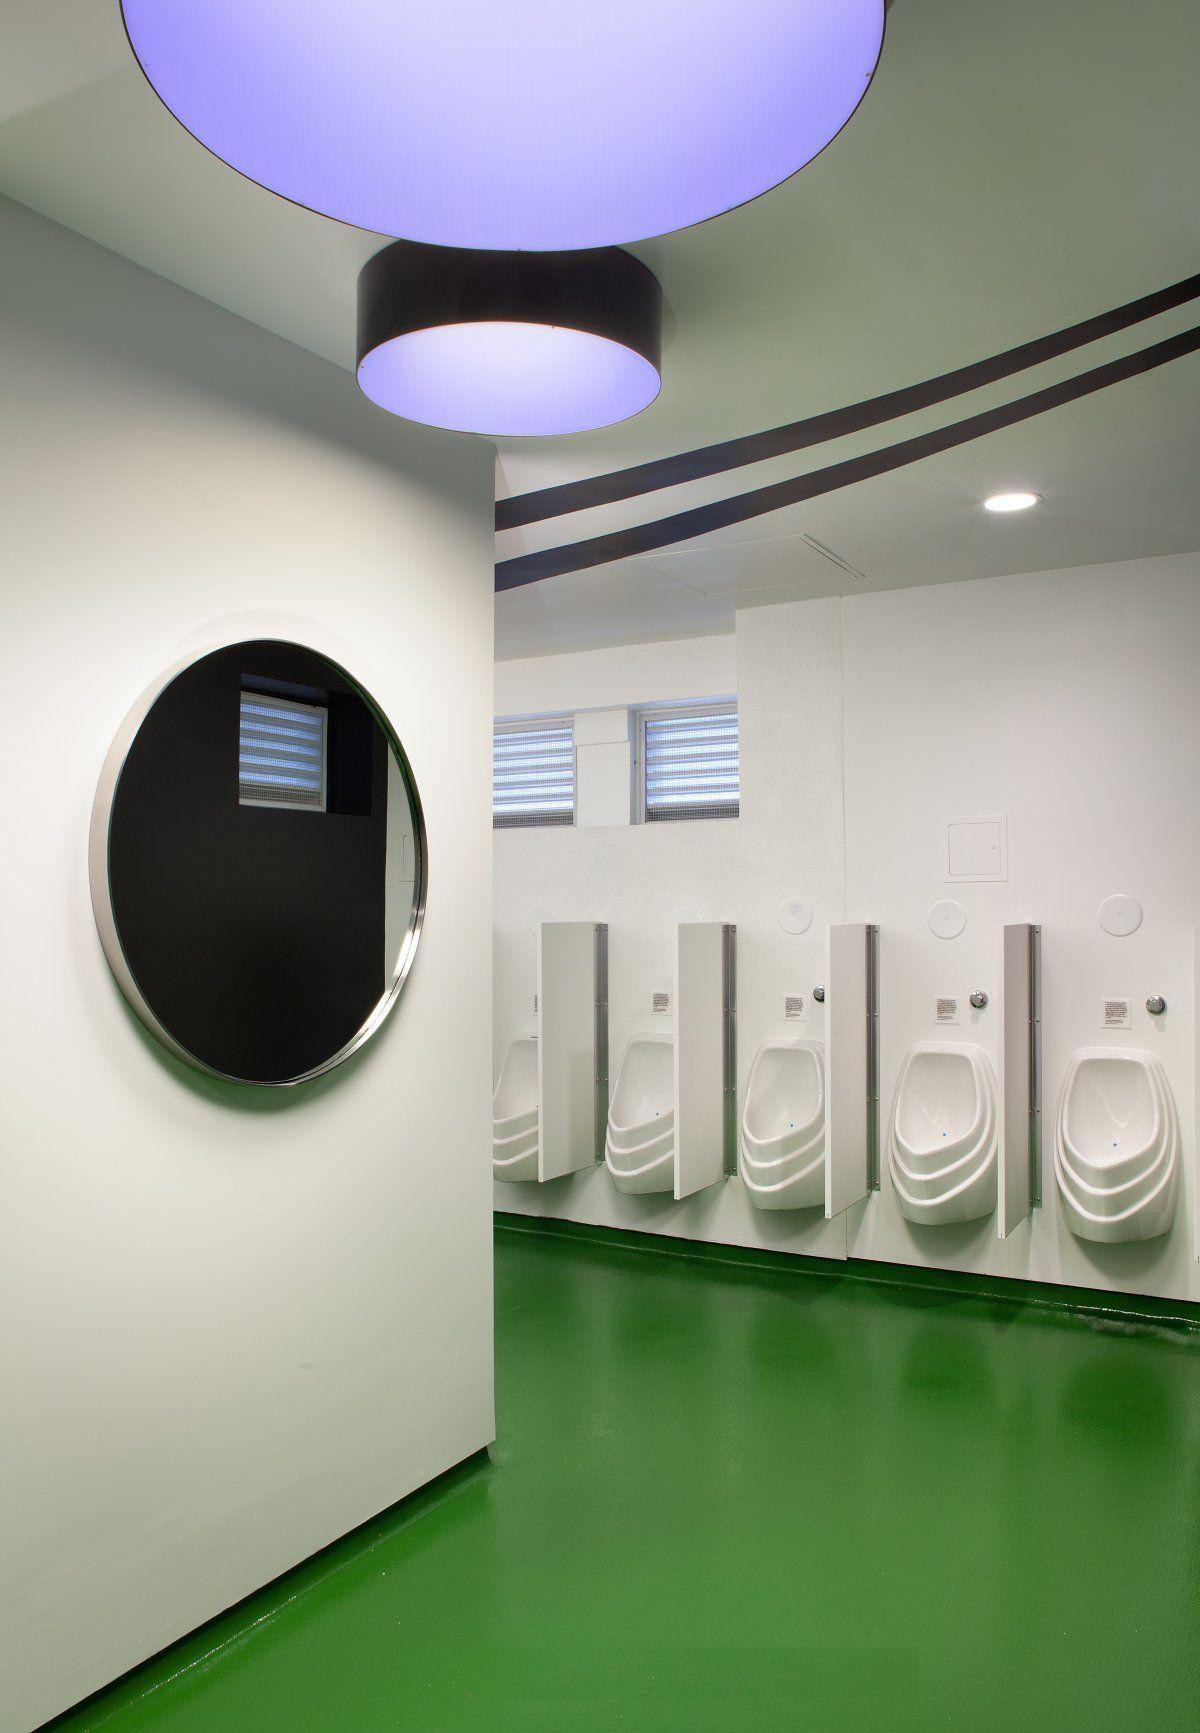 Best Bathroom Design Software the 10 best public bathrooms in america   bathroom design software